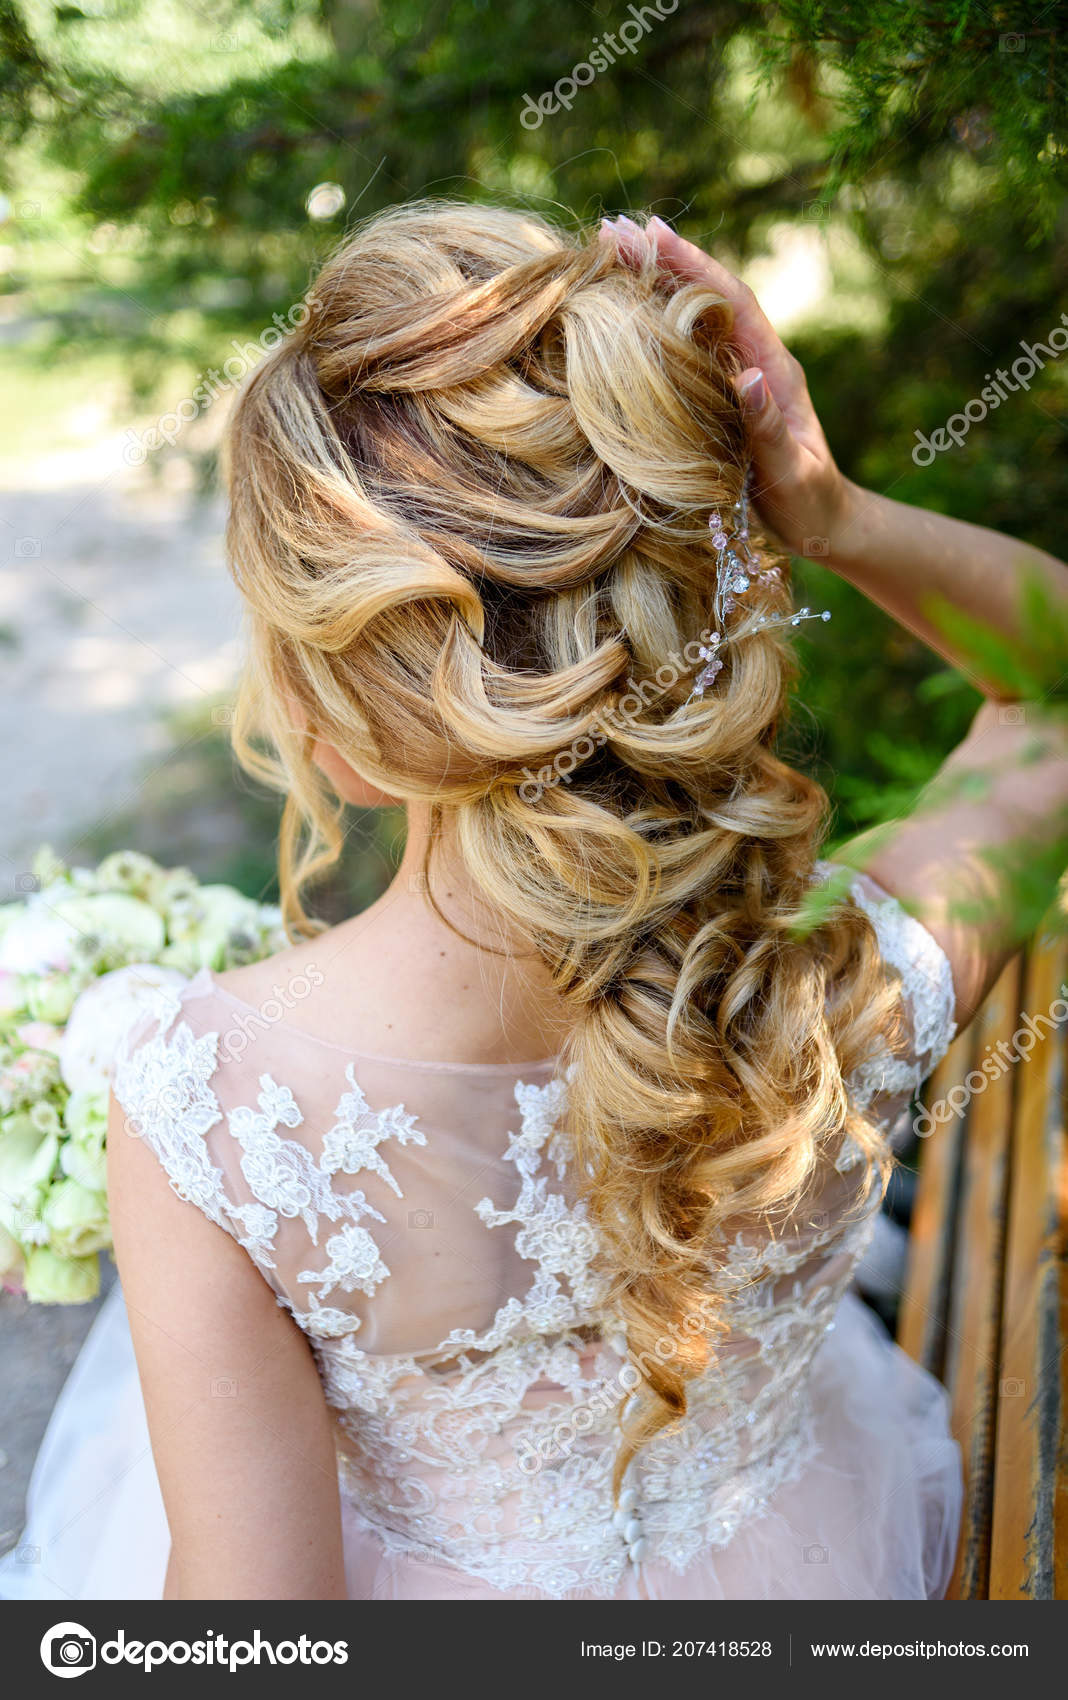 Beautiful Bride Fashion Wedding Hairstyle Jewelry Back View Blond